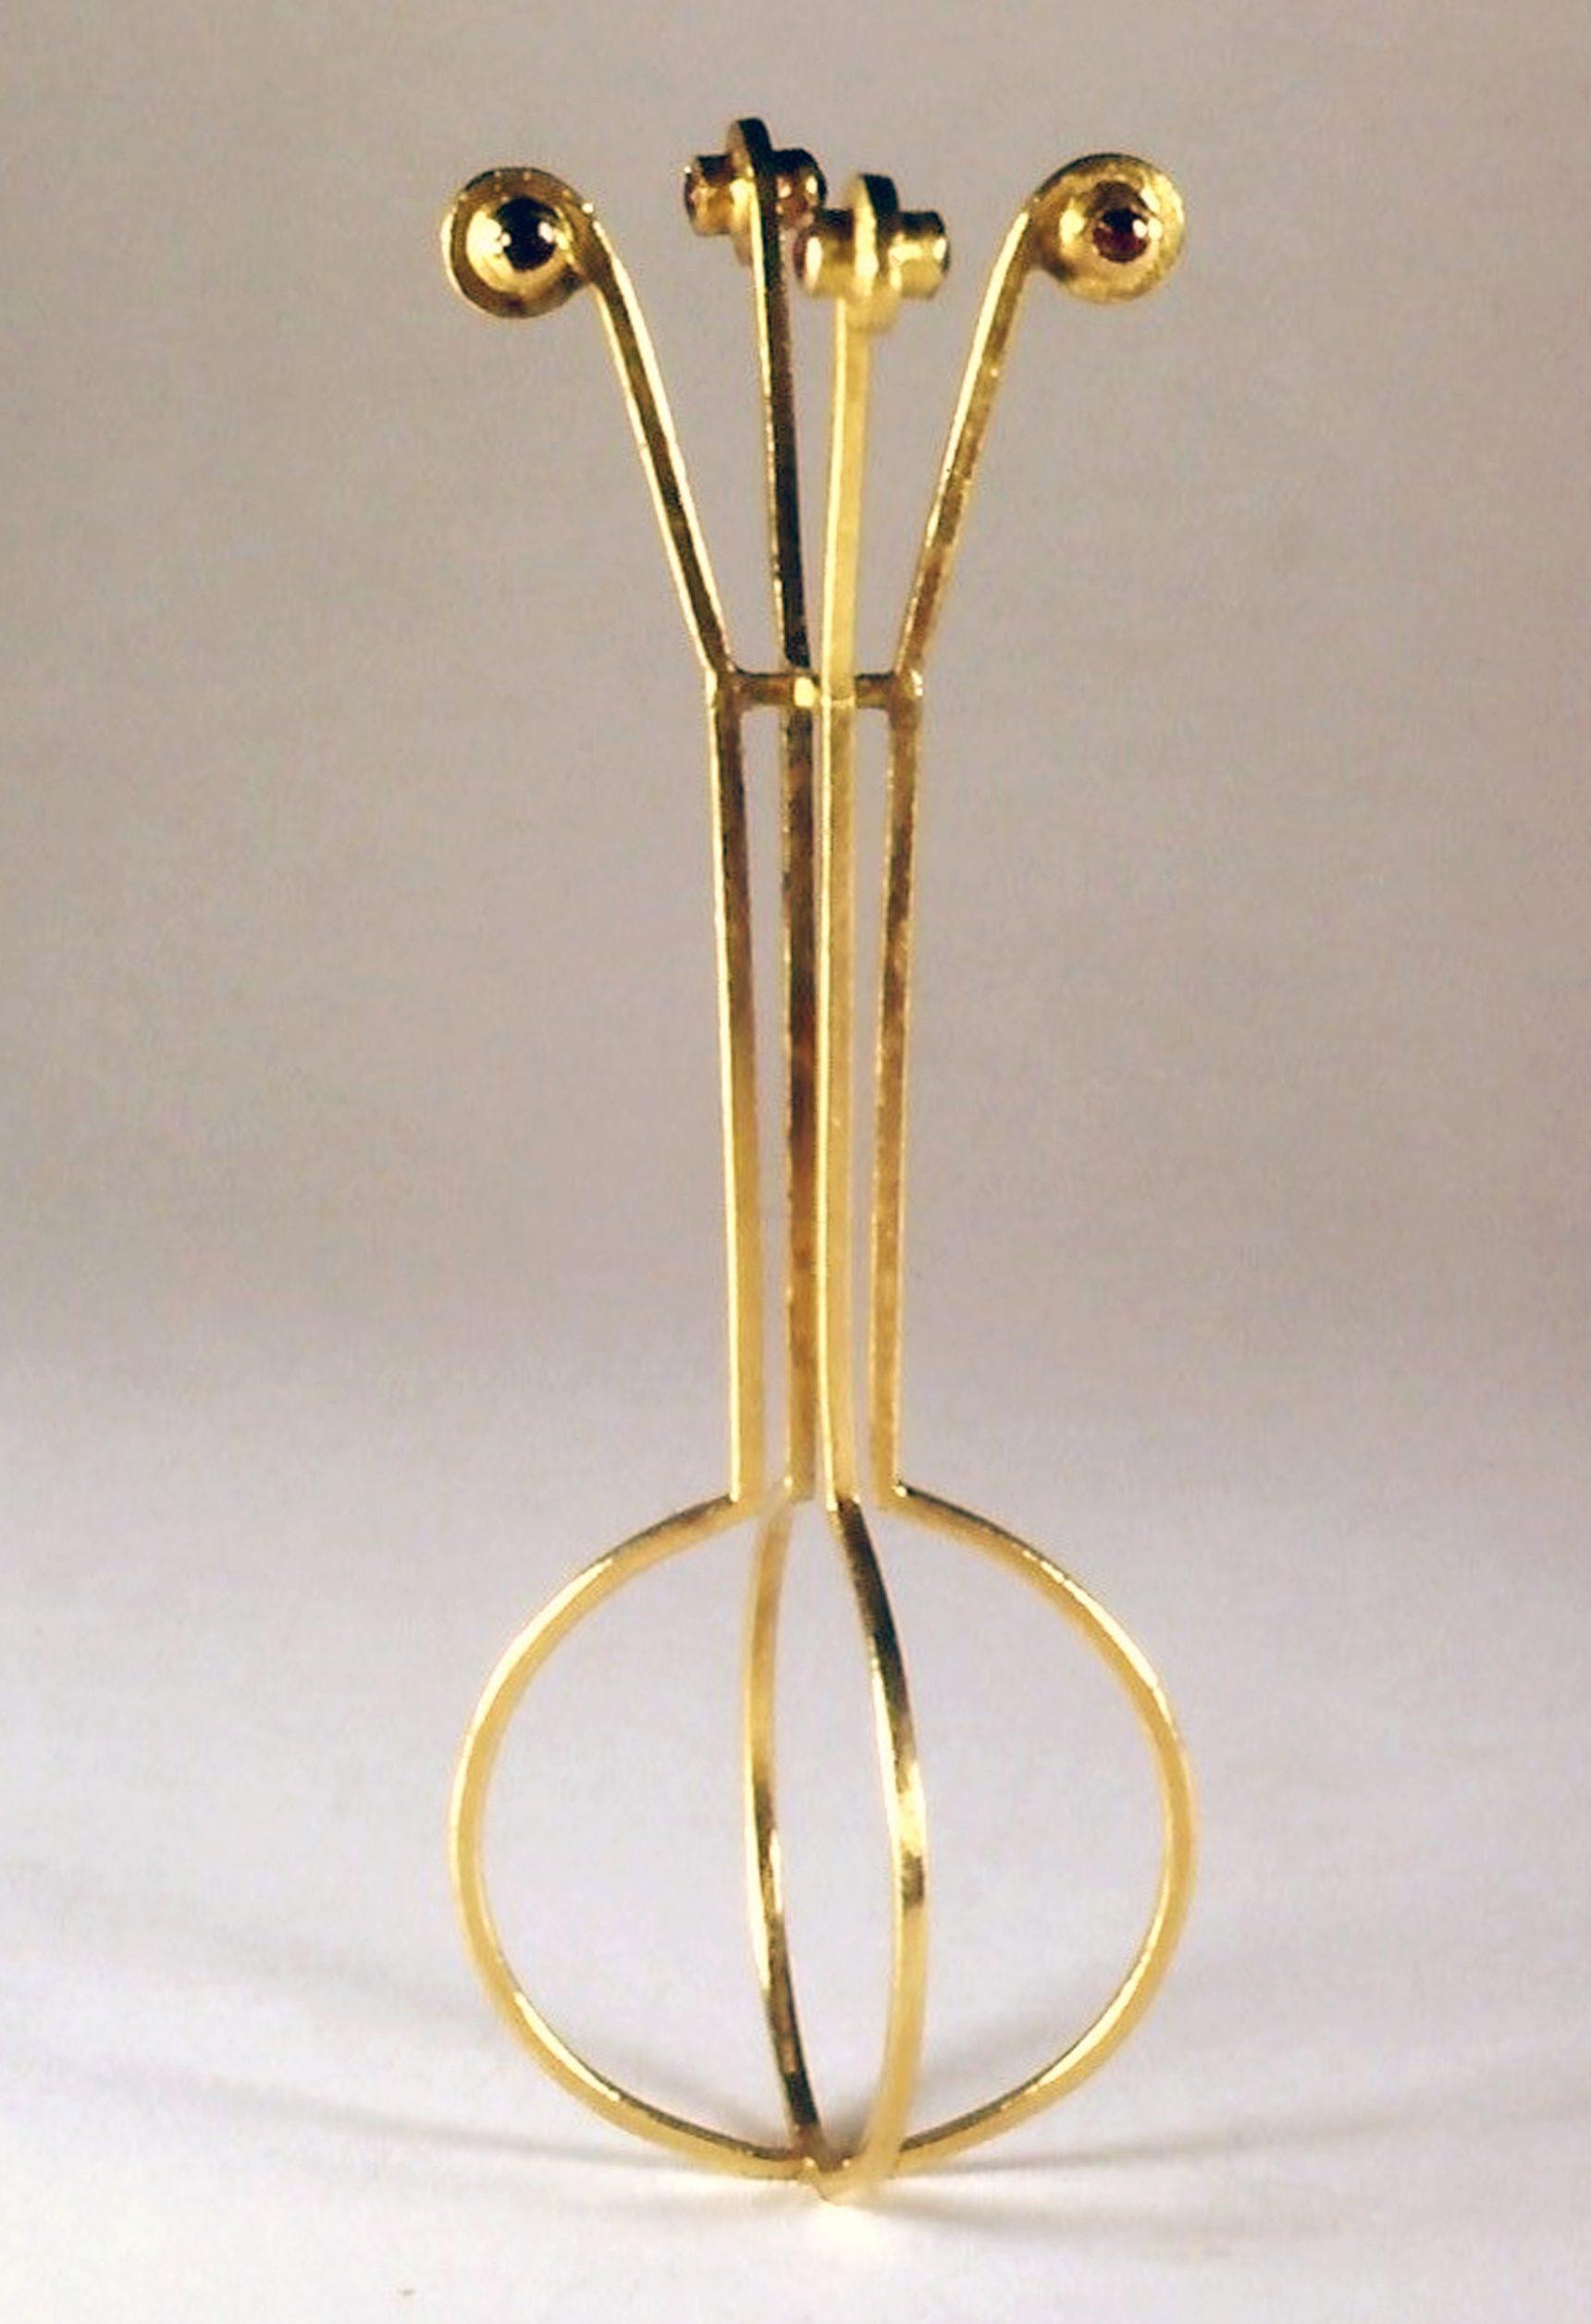 Francesca di Ciaula, Flower's vase, ring, 1987. Collectie Museum Arnhem. Foto met dank aan Francesca di Ciaula©